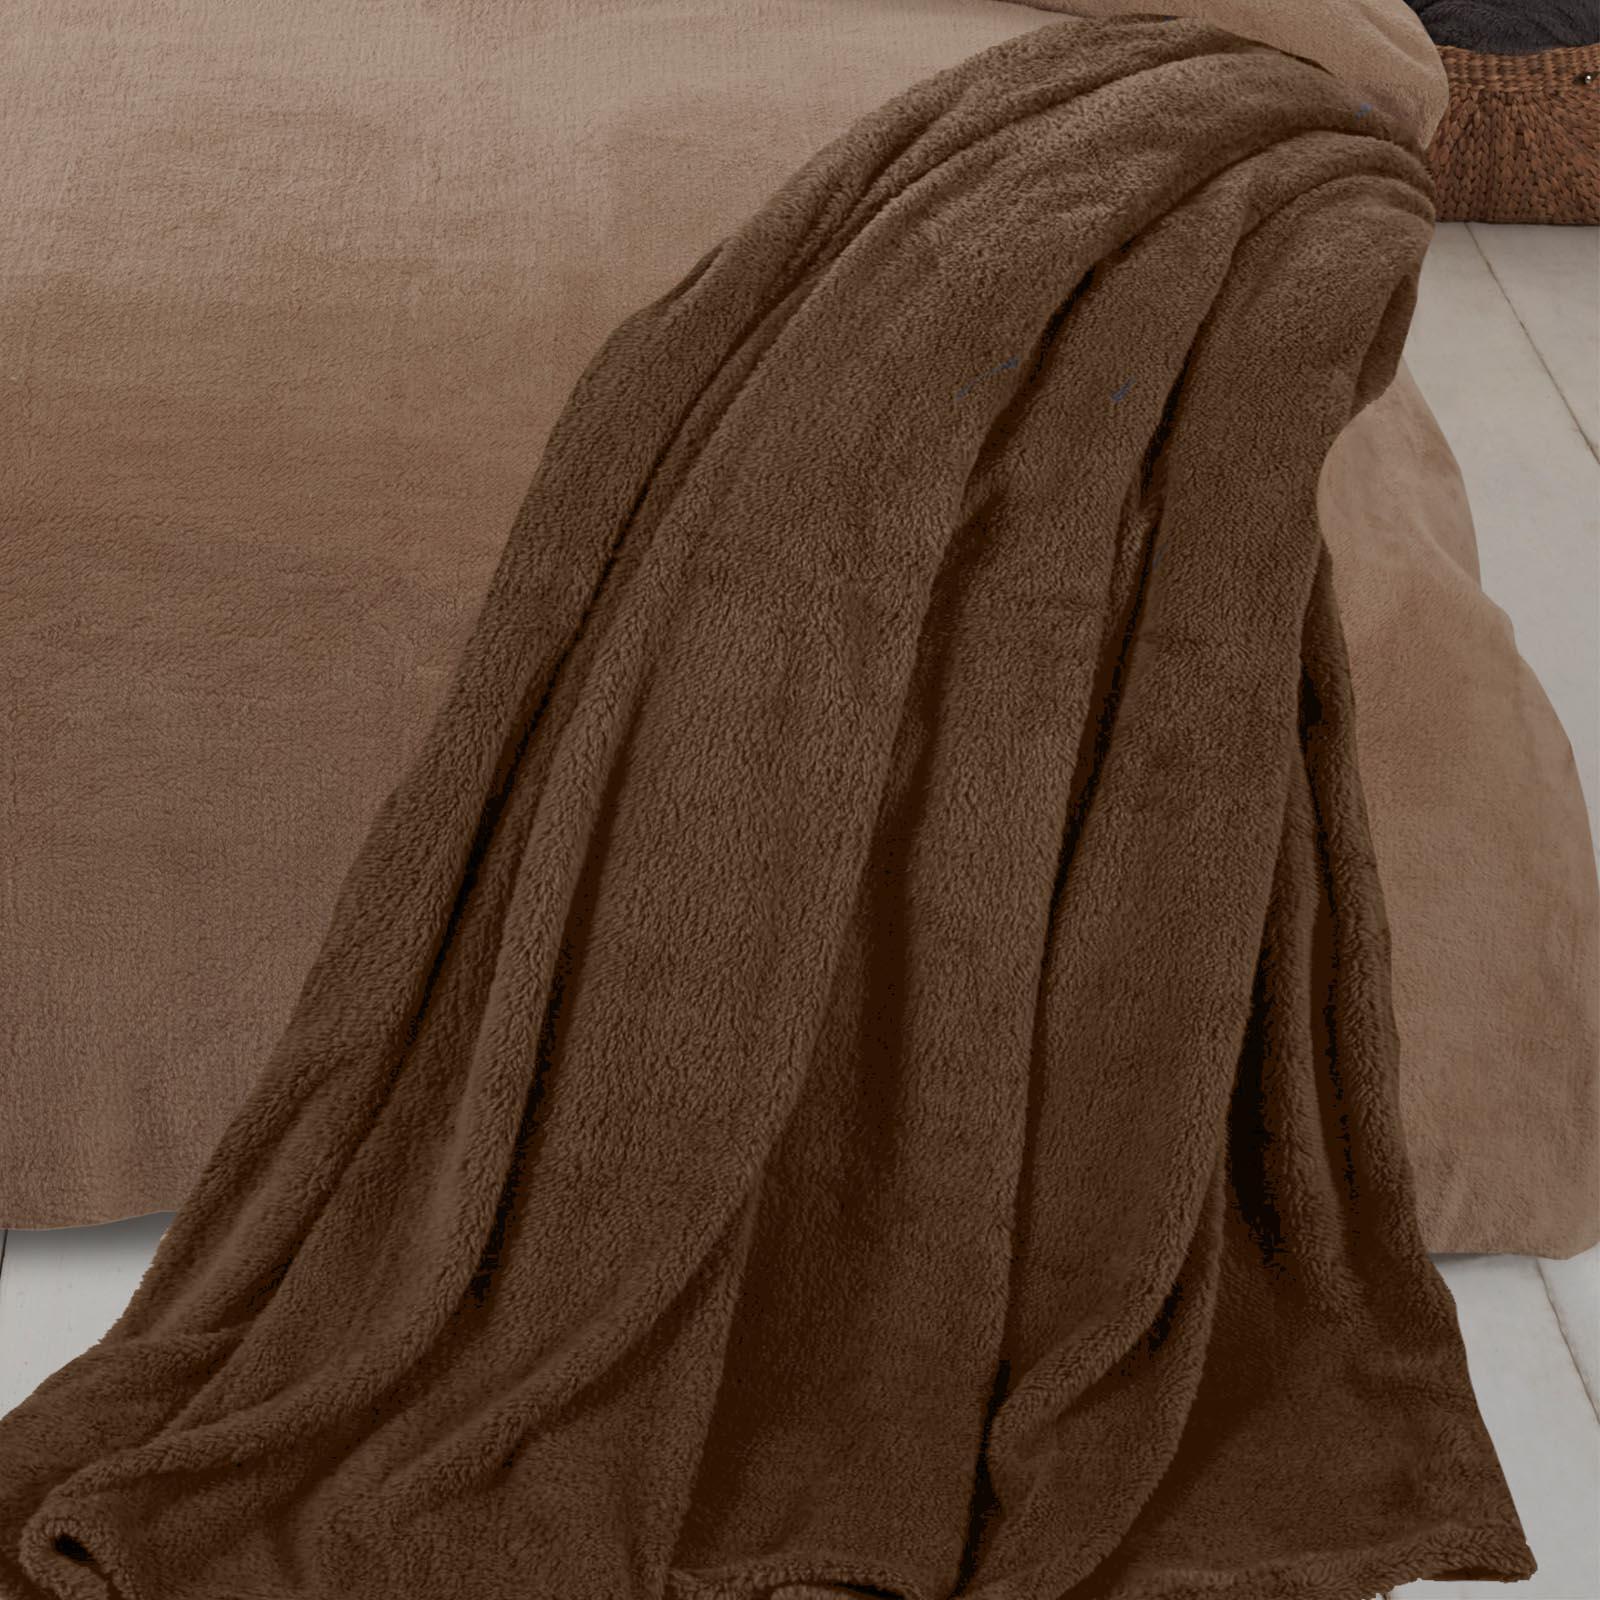 Brentfords-Teddy-Fleece-Bear-Blanket-Large-Throw-Over-Bed-Plush-Soft-Bedspread thumbnail 13